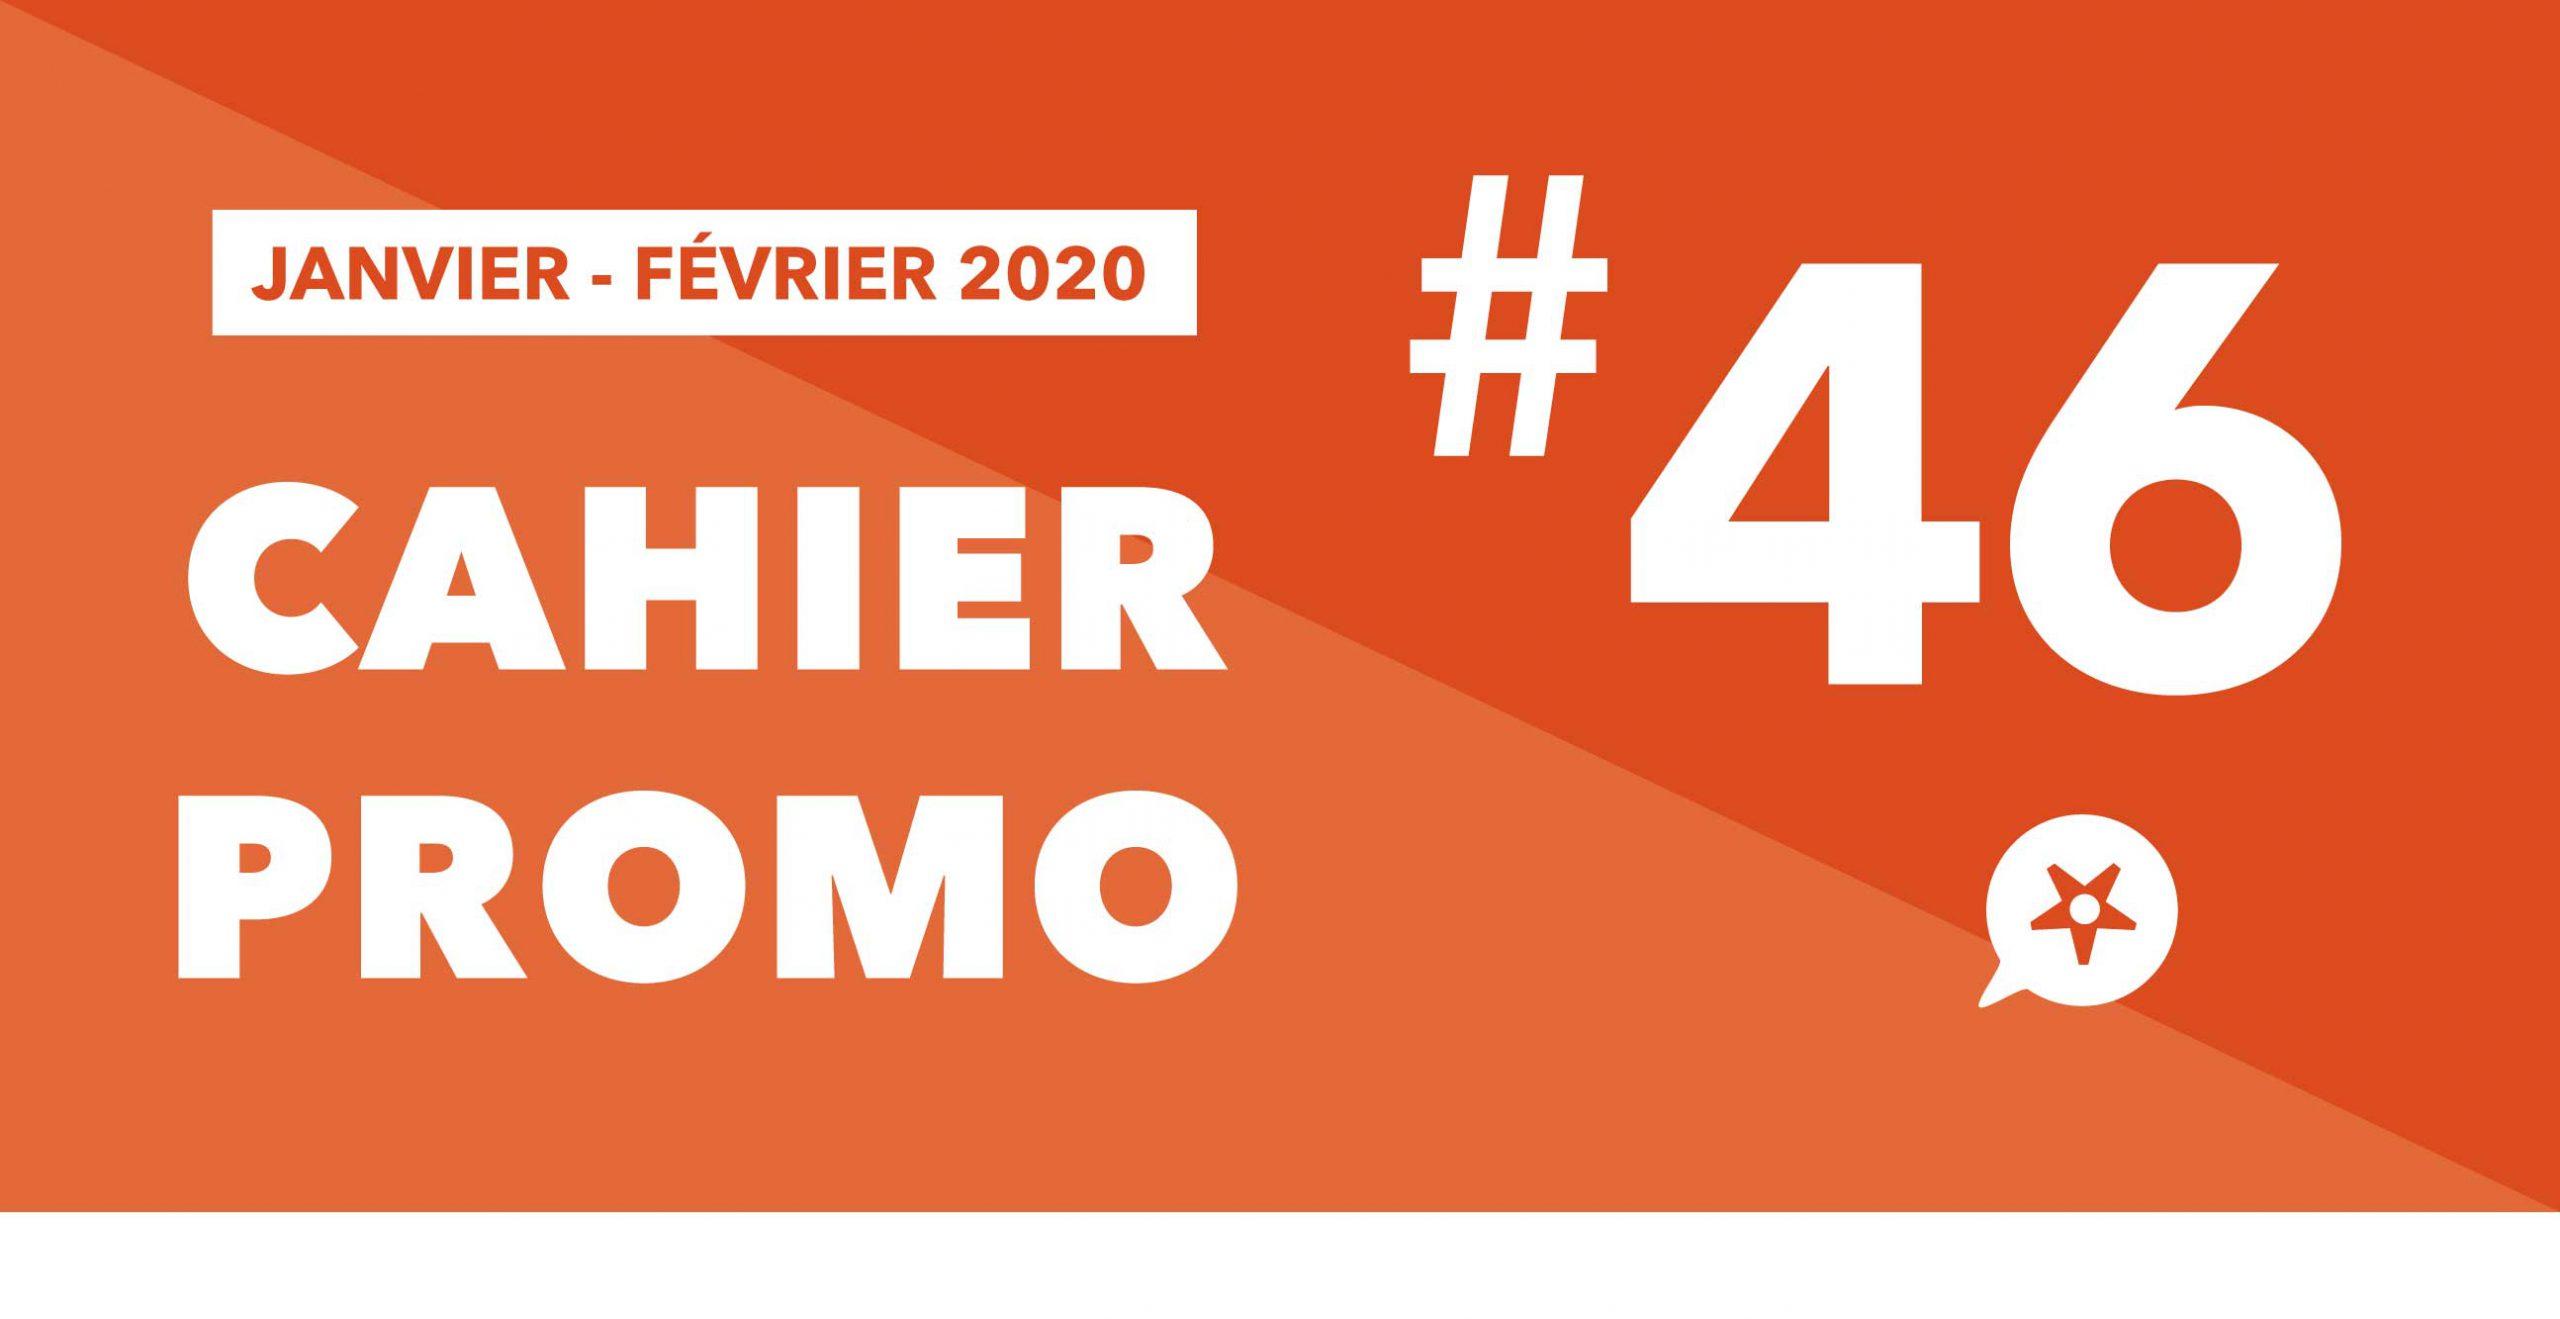 CAHIER PROMO JANVIER FEVRIER 2020